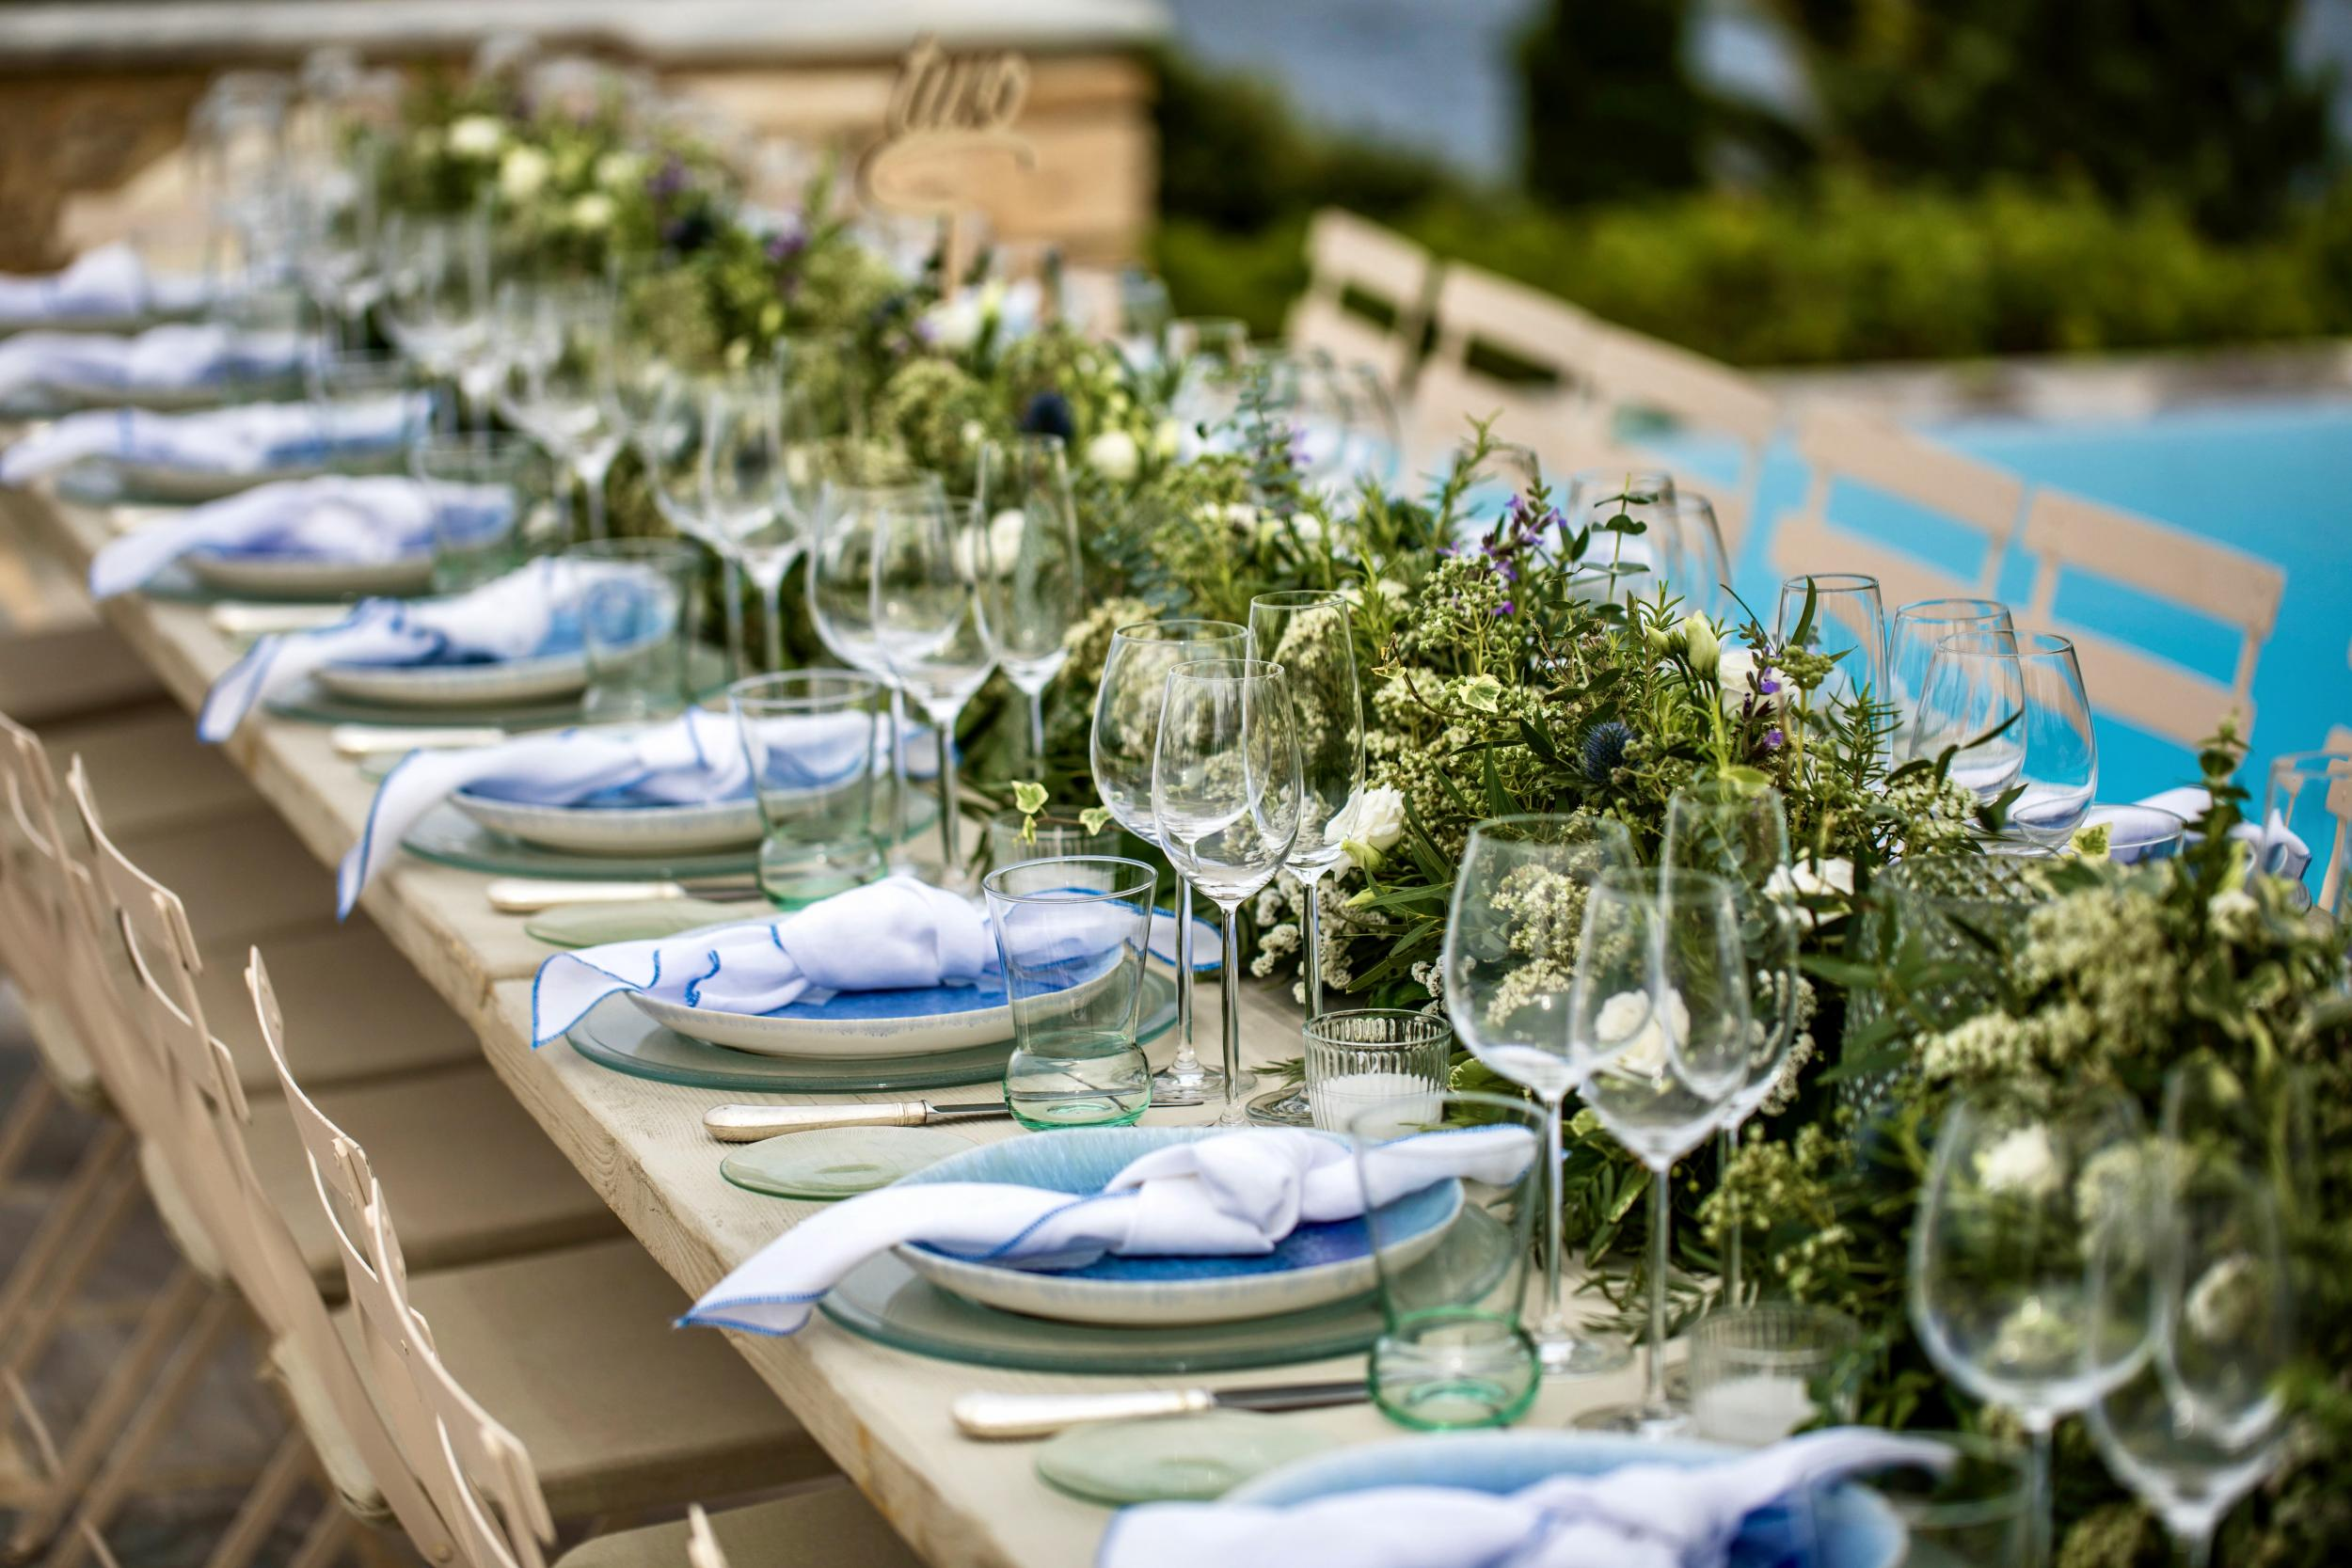 Blue plate set - Image 2